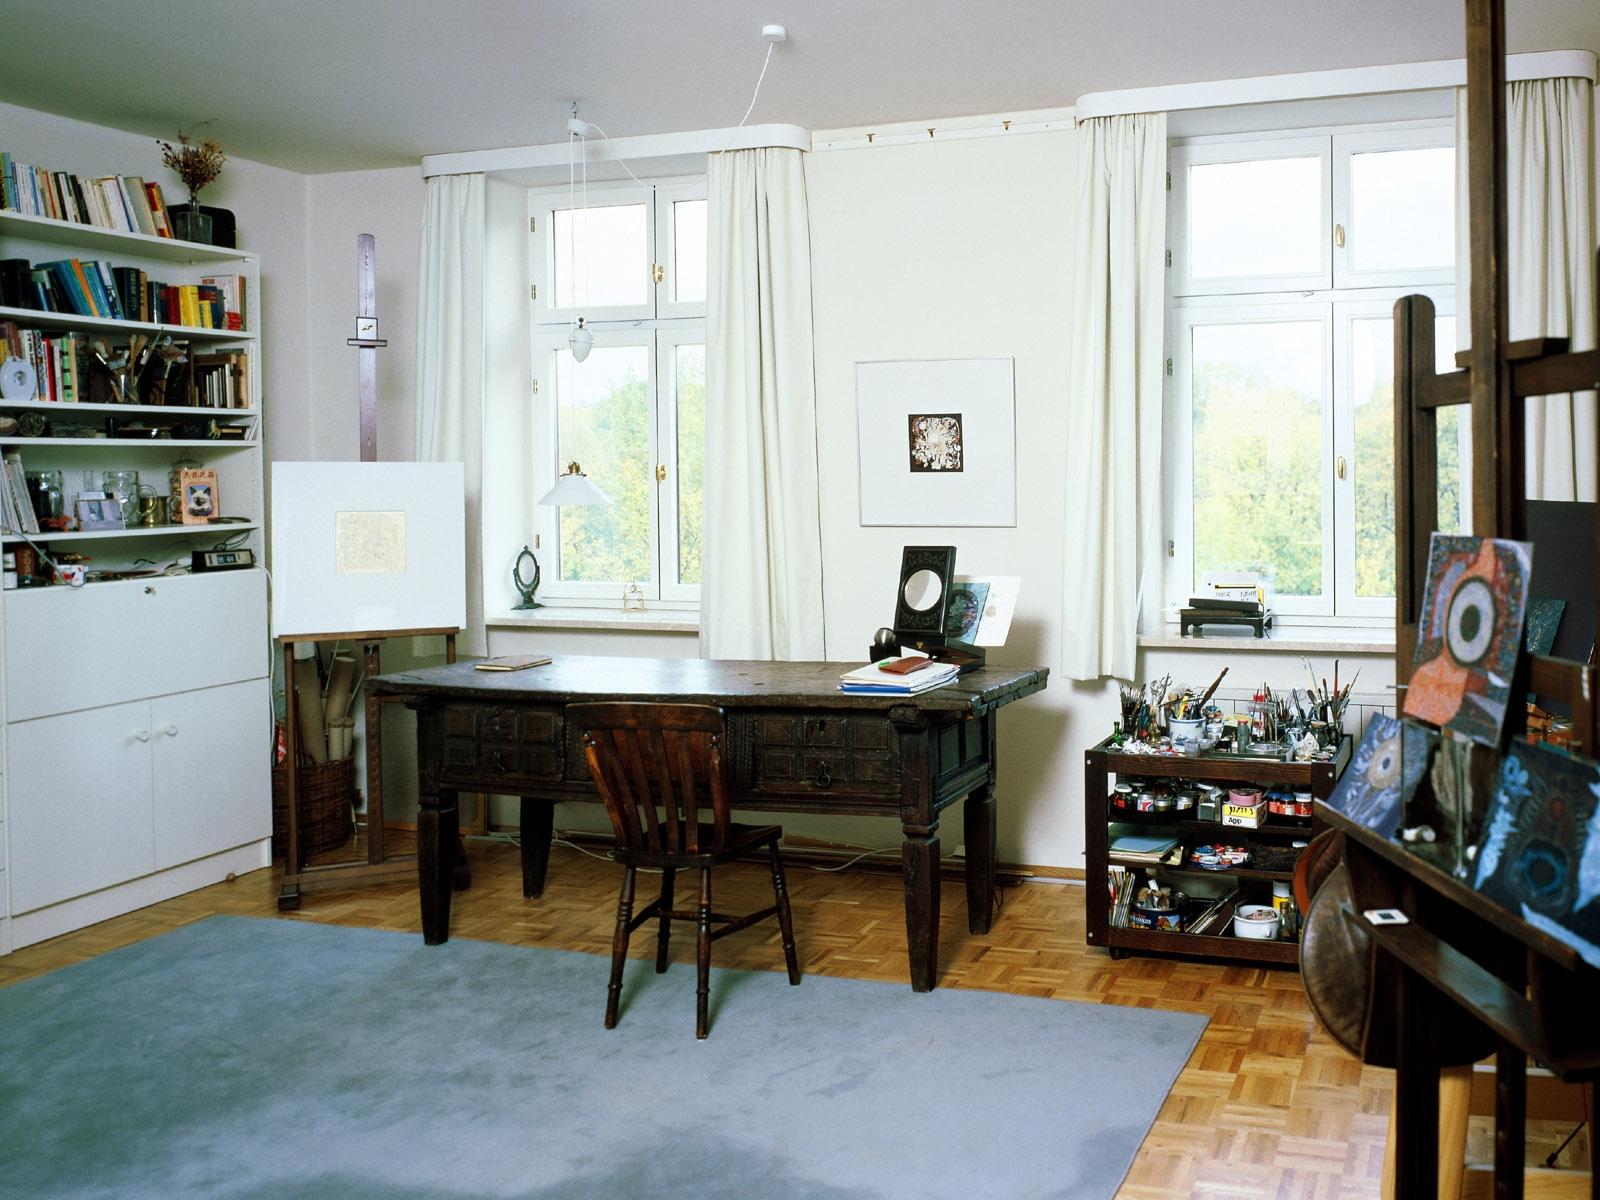 Fondos de pantalla : habitación, interior, casa, cocina, diseño de ...